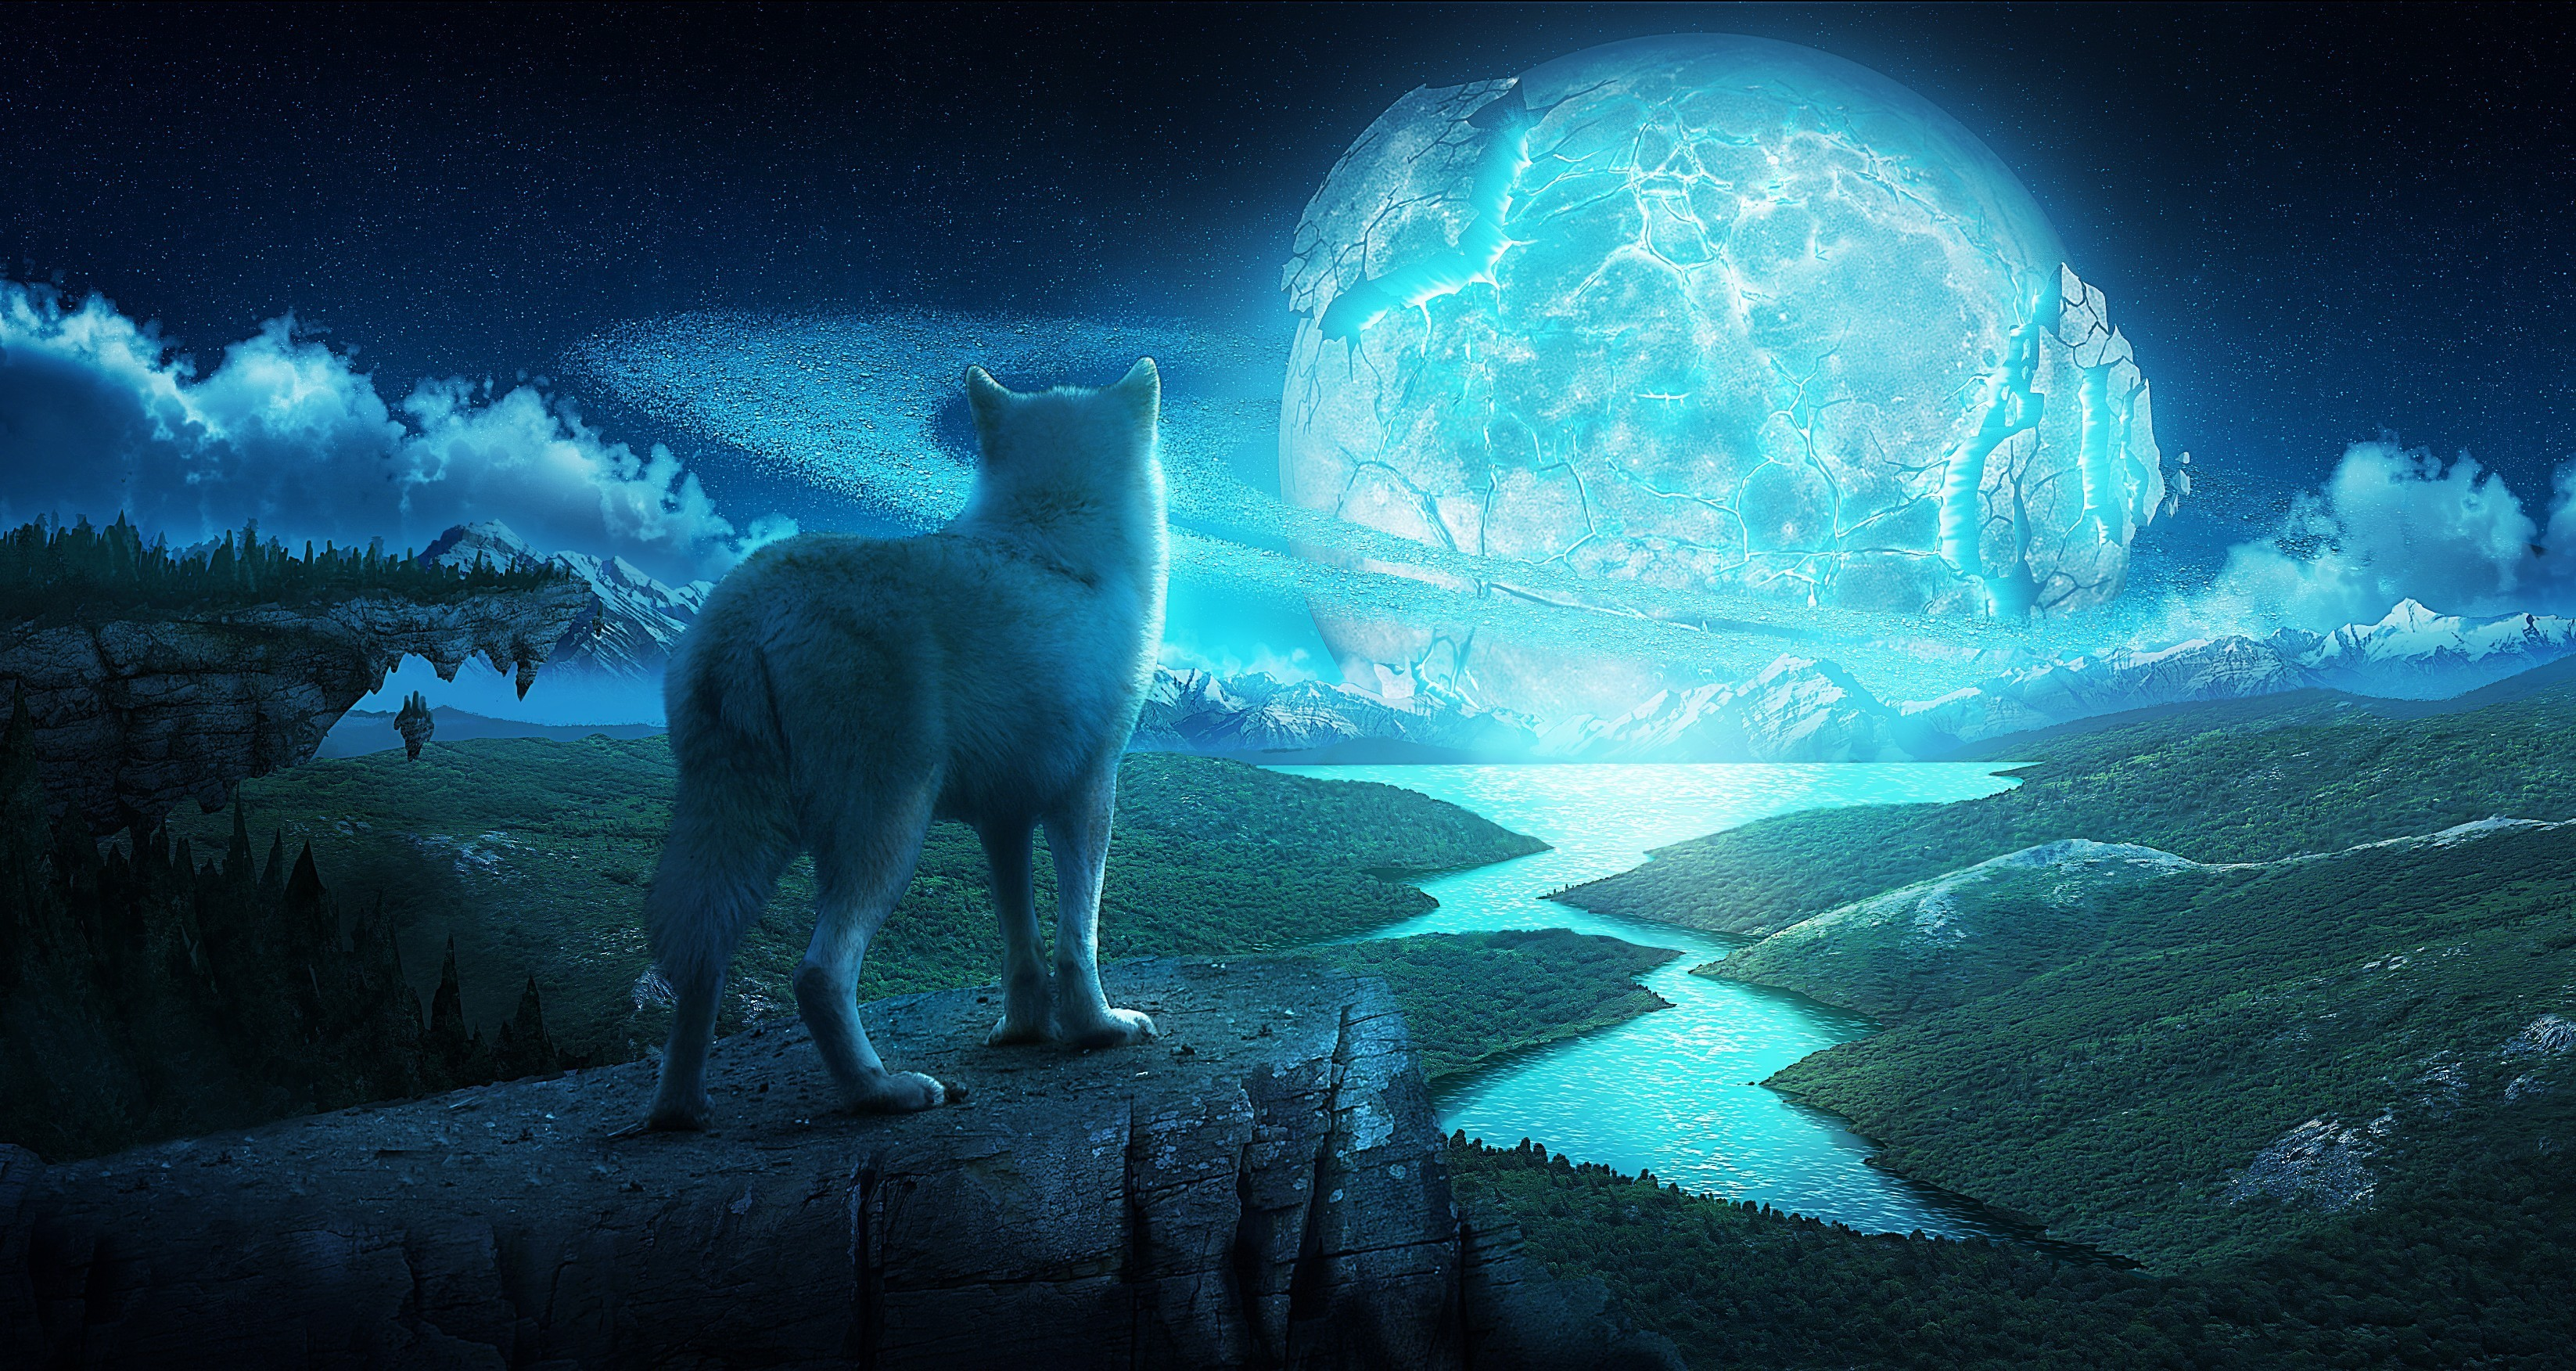 Wolf Desktop Backgrounds